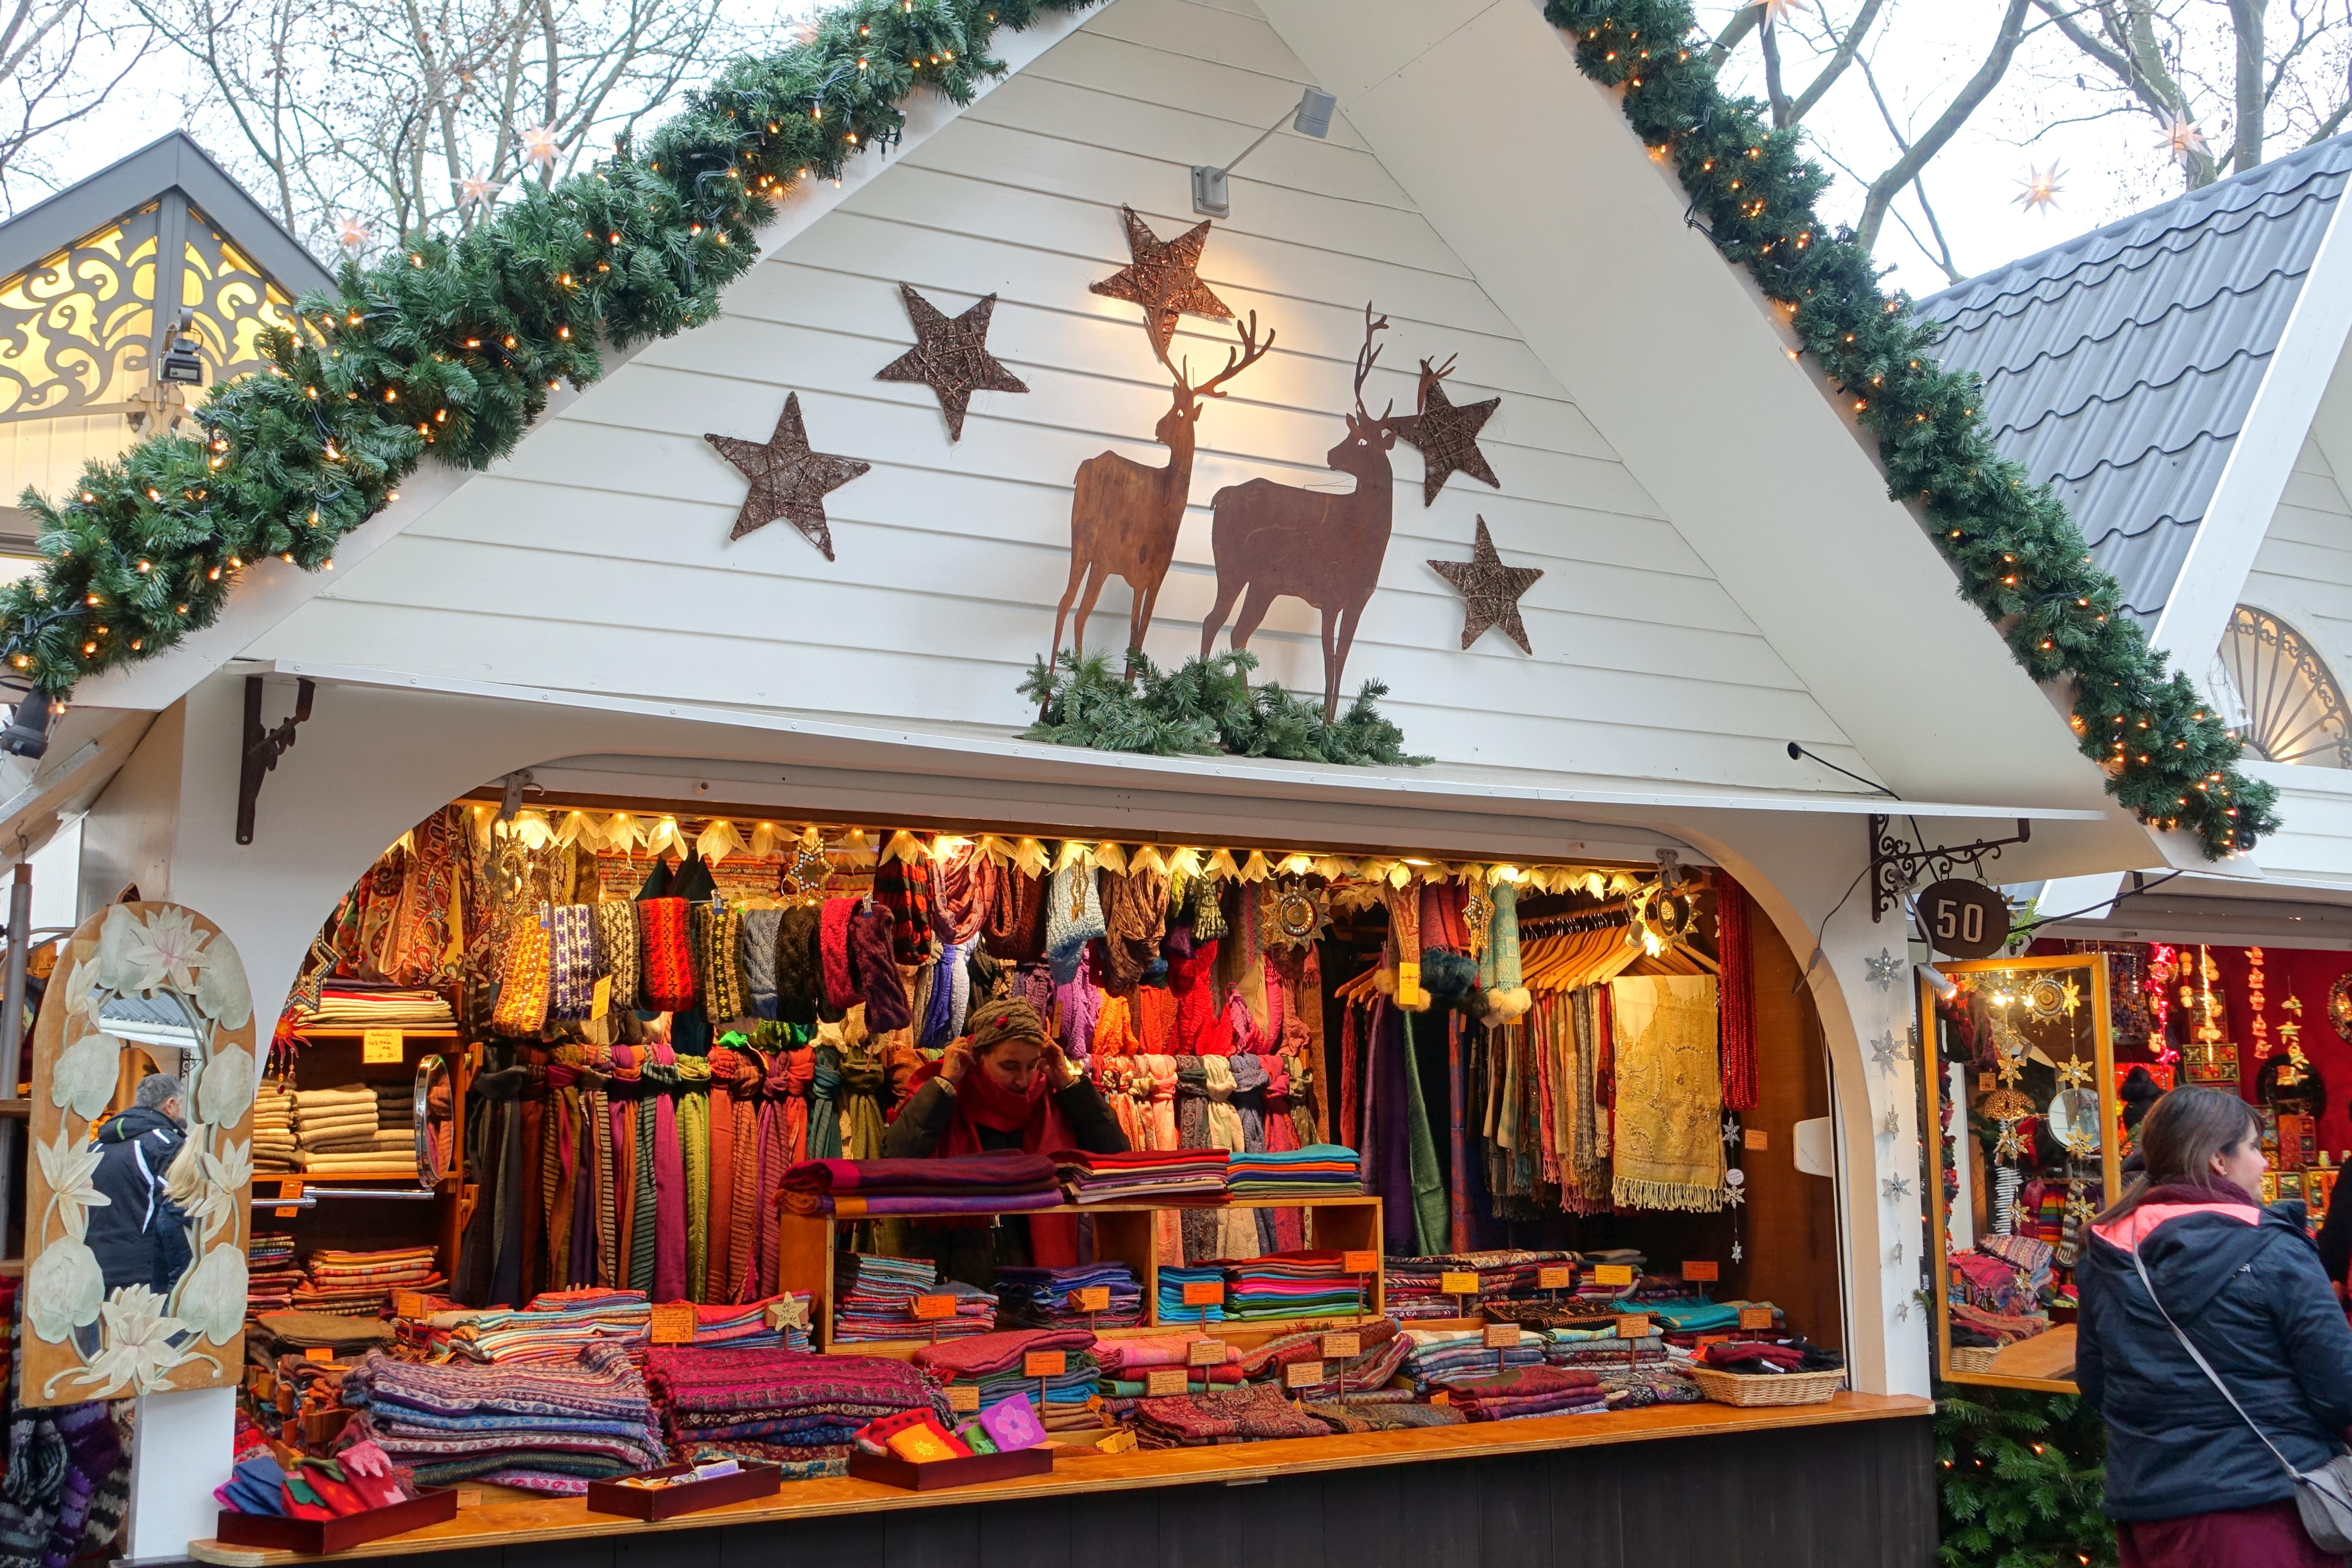 File:Stall - Cologne Christmas markets - DSC09720.jpg - Wikimedia ...